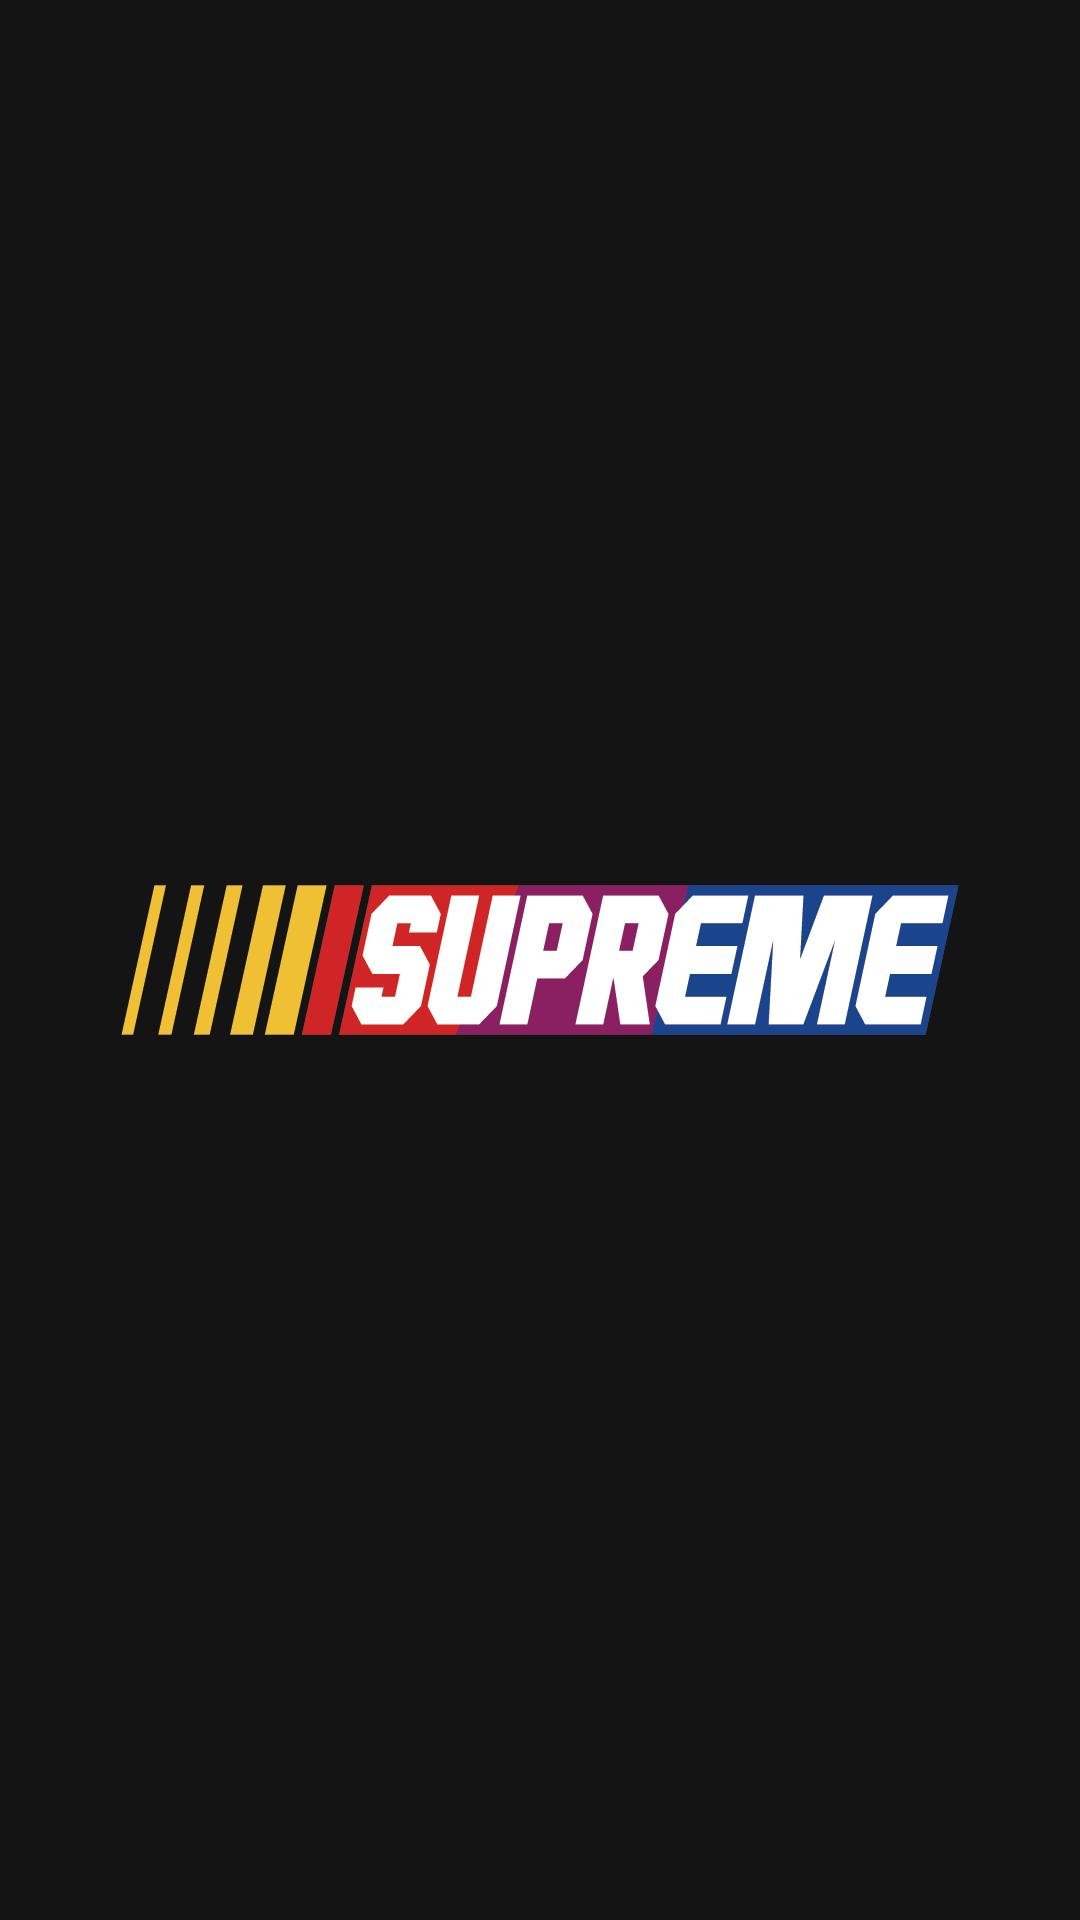 Supreme Logo Wallpapers Wallpaper Cave